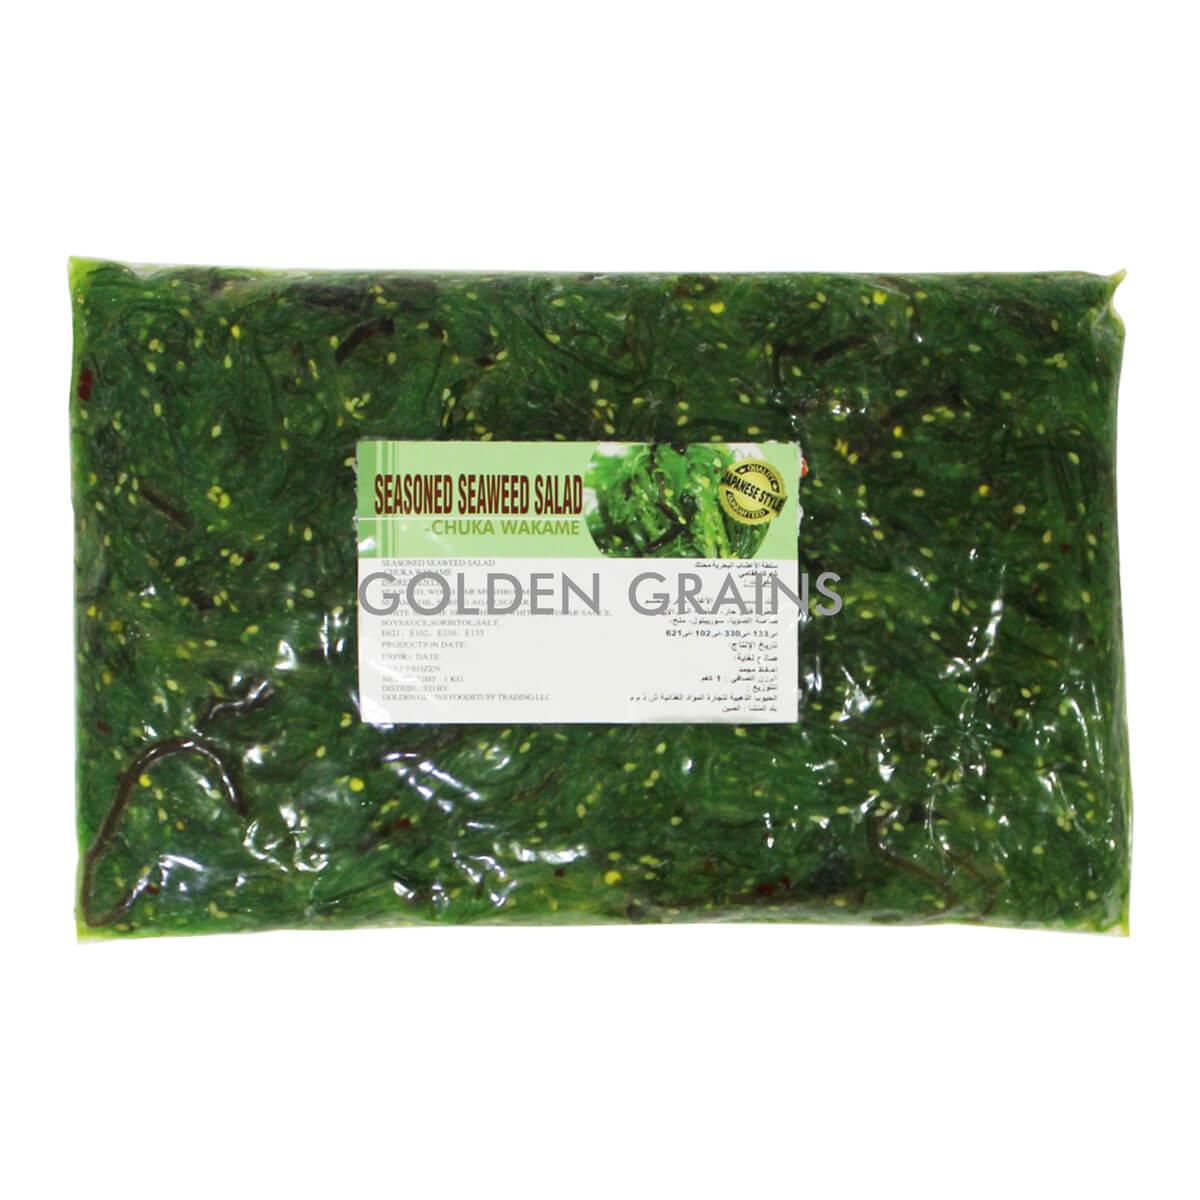 Golden Grains GGFT - Chuka Wakame - Front.jpg